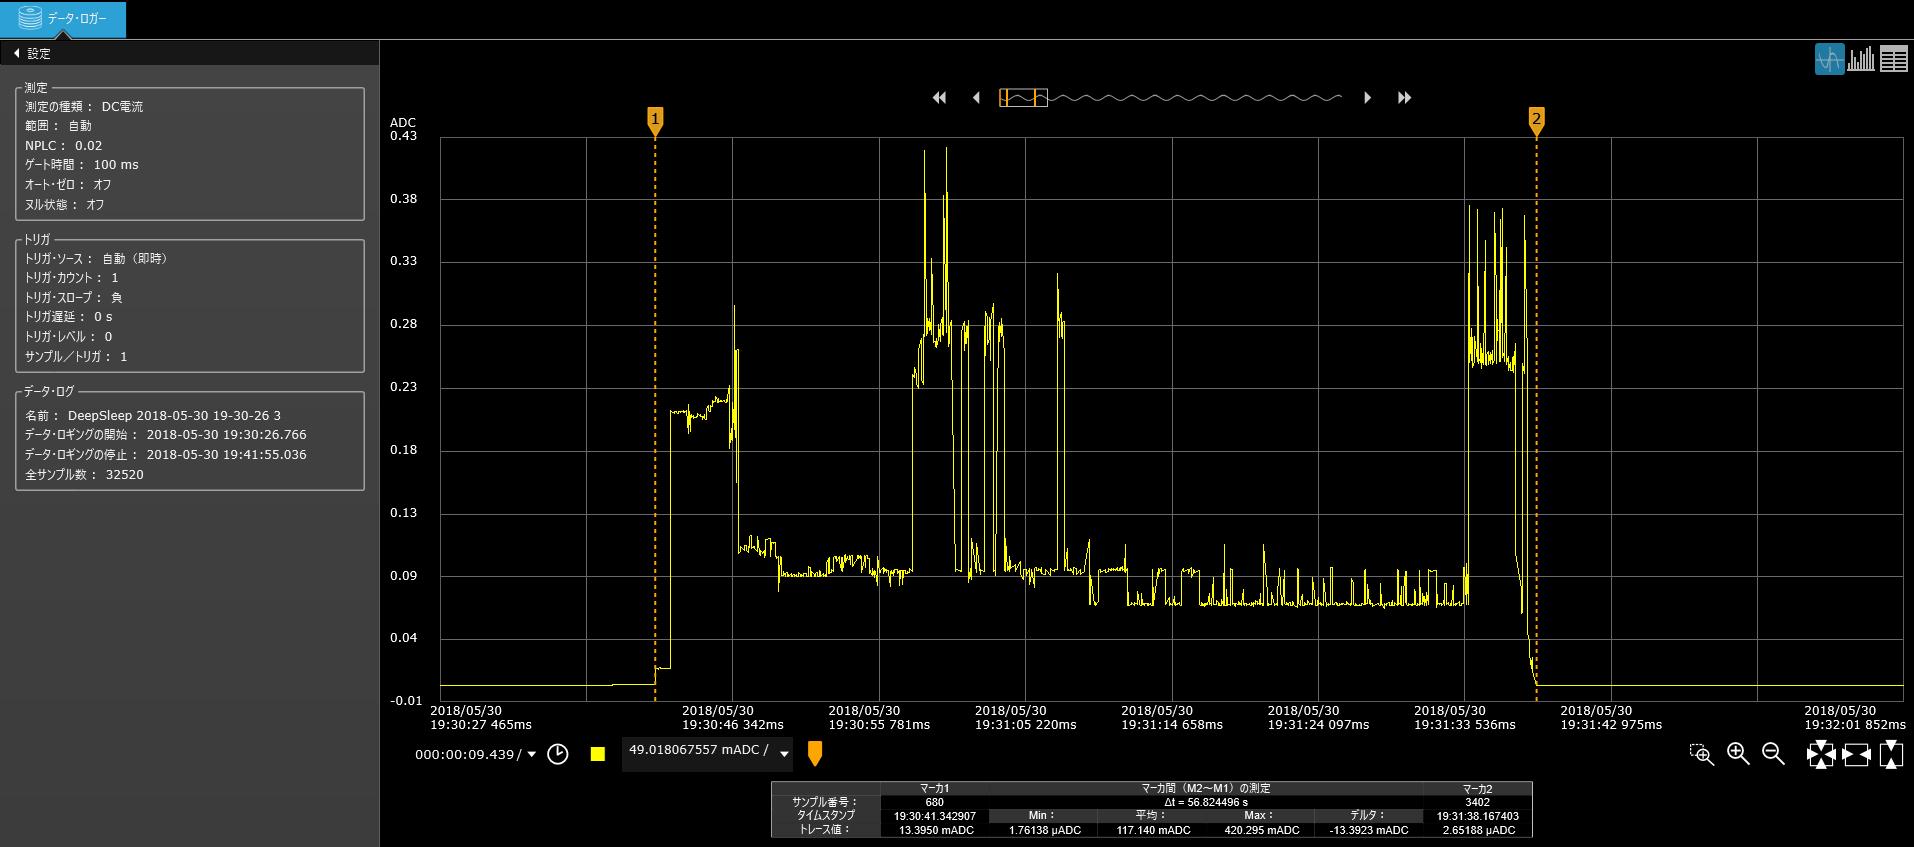 sakura.ioモジュール(LTE)の省電力機能